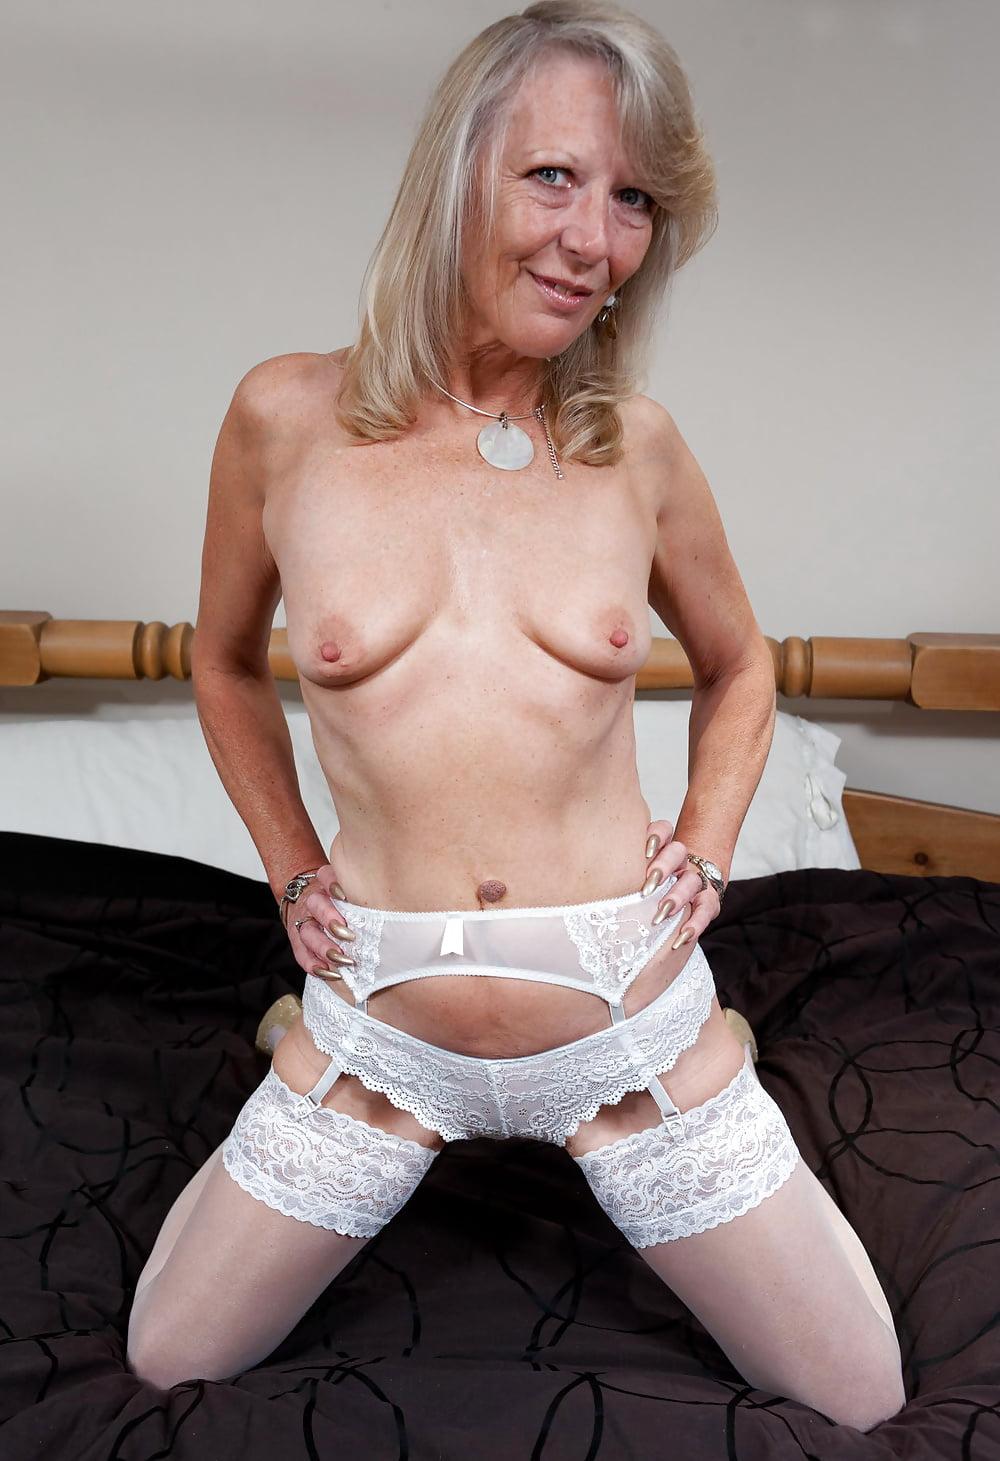 Skinny granny, porn galery